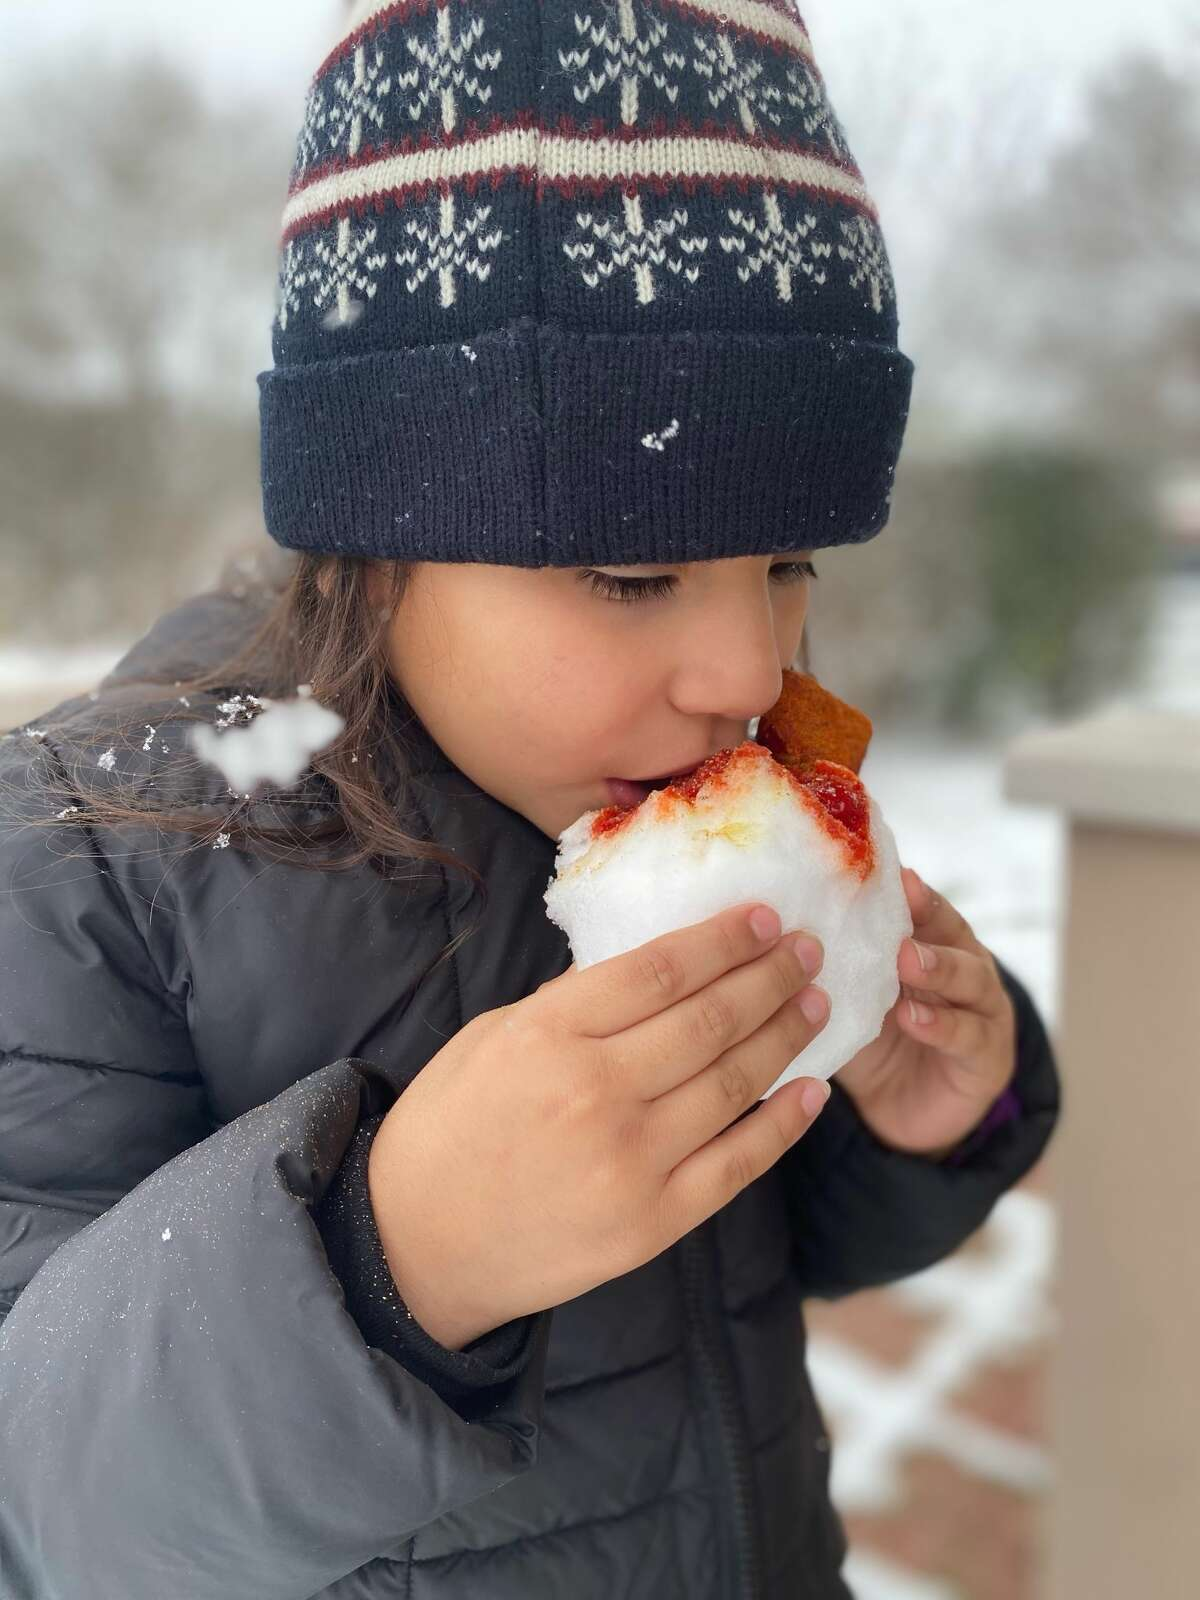 Makaylah Rose took a very San Antonio approach to snow this week.